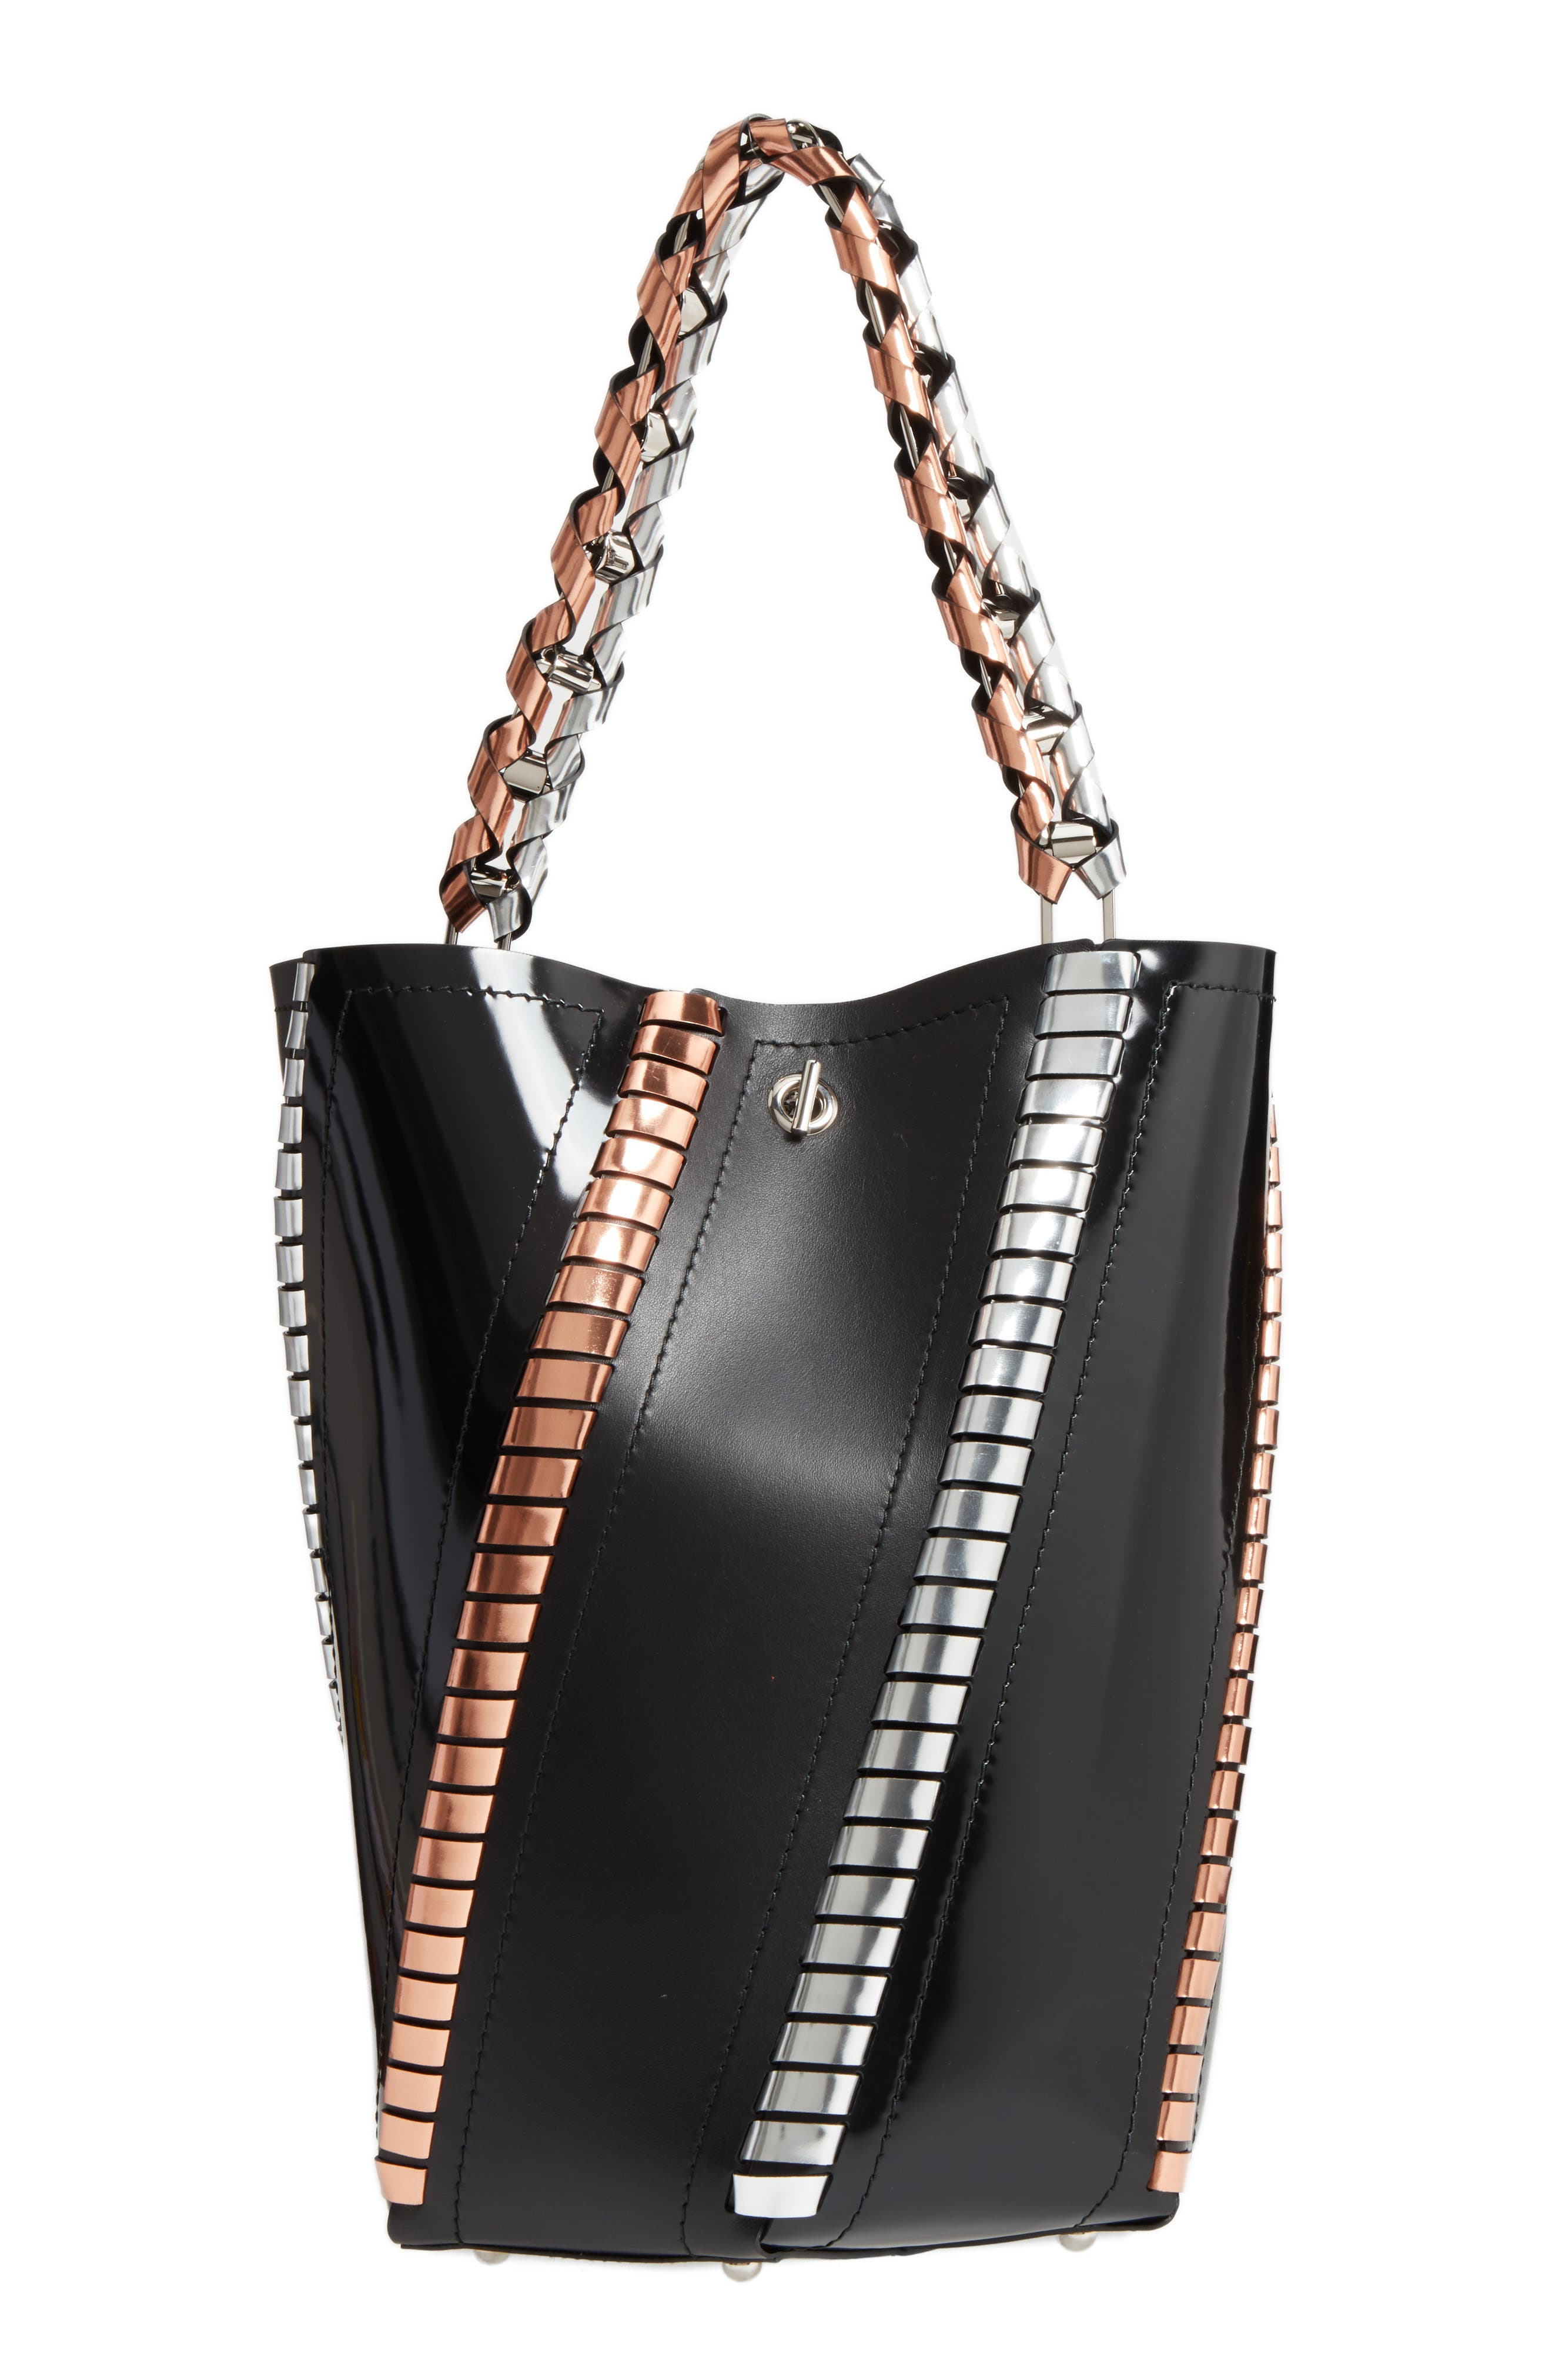 Alternate Image 1 Selected - Proenza Schouler Medium Hex Metallic Whipstitch Leather Bucket Bag